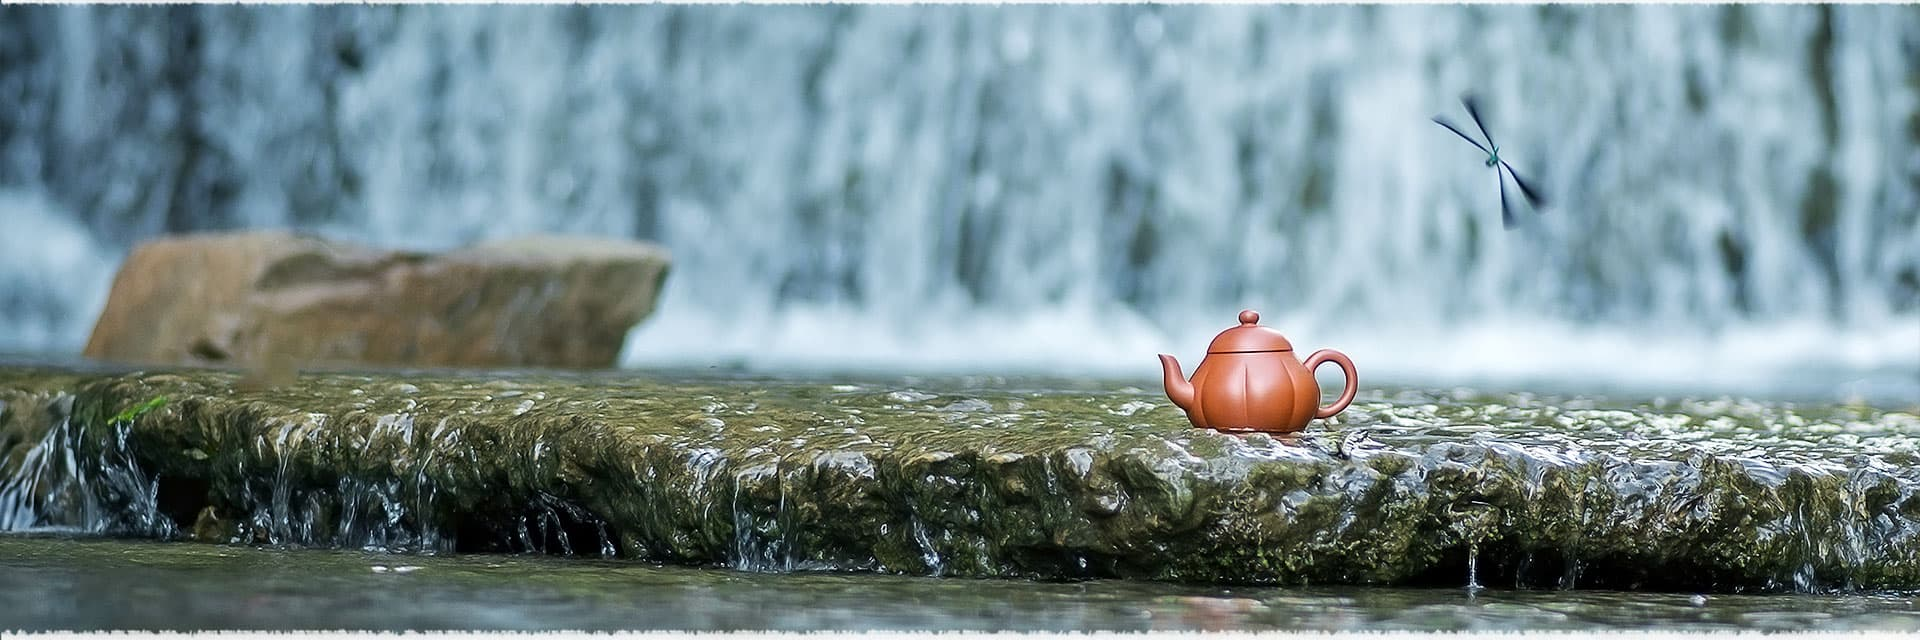 Fully handmade vs Half-handmade Yixing Zisha Teapot